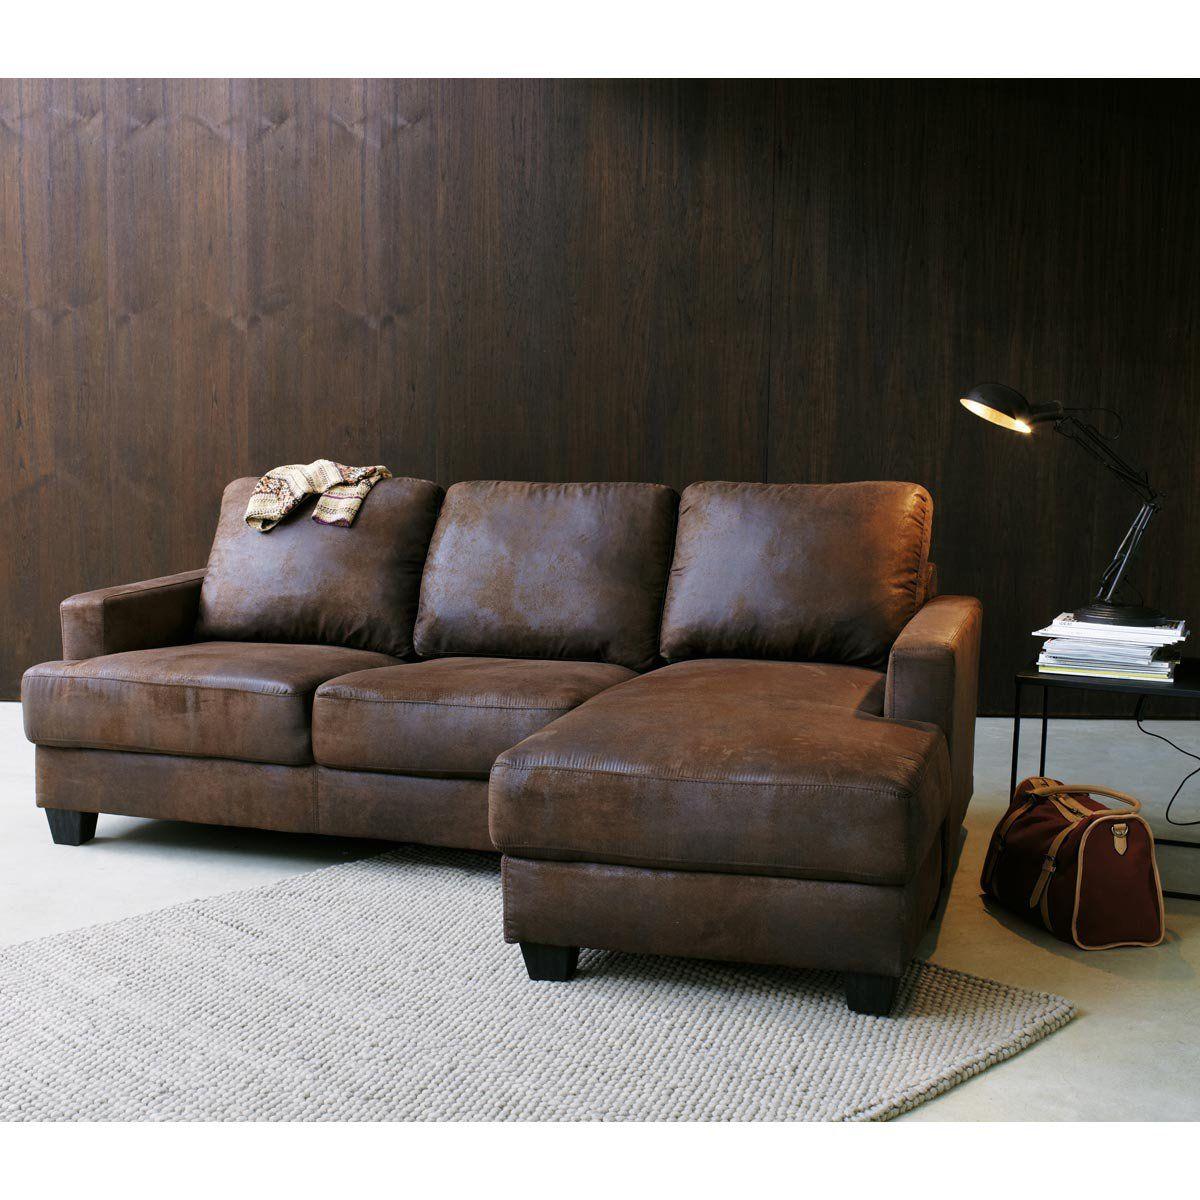 3/4 seat leather corner sofa in brown PHILADELPHIE